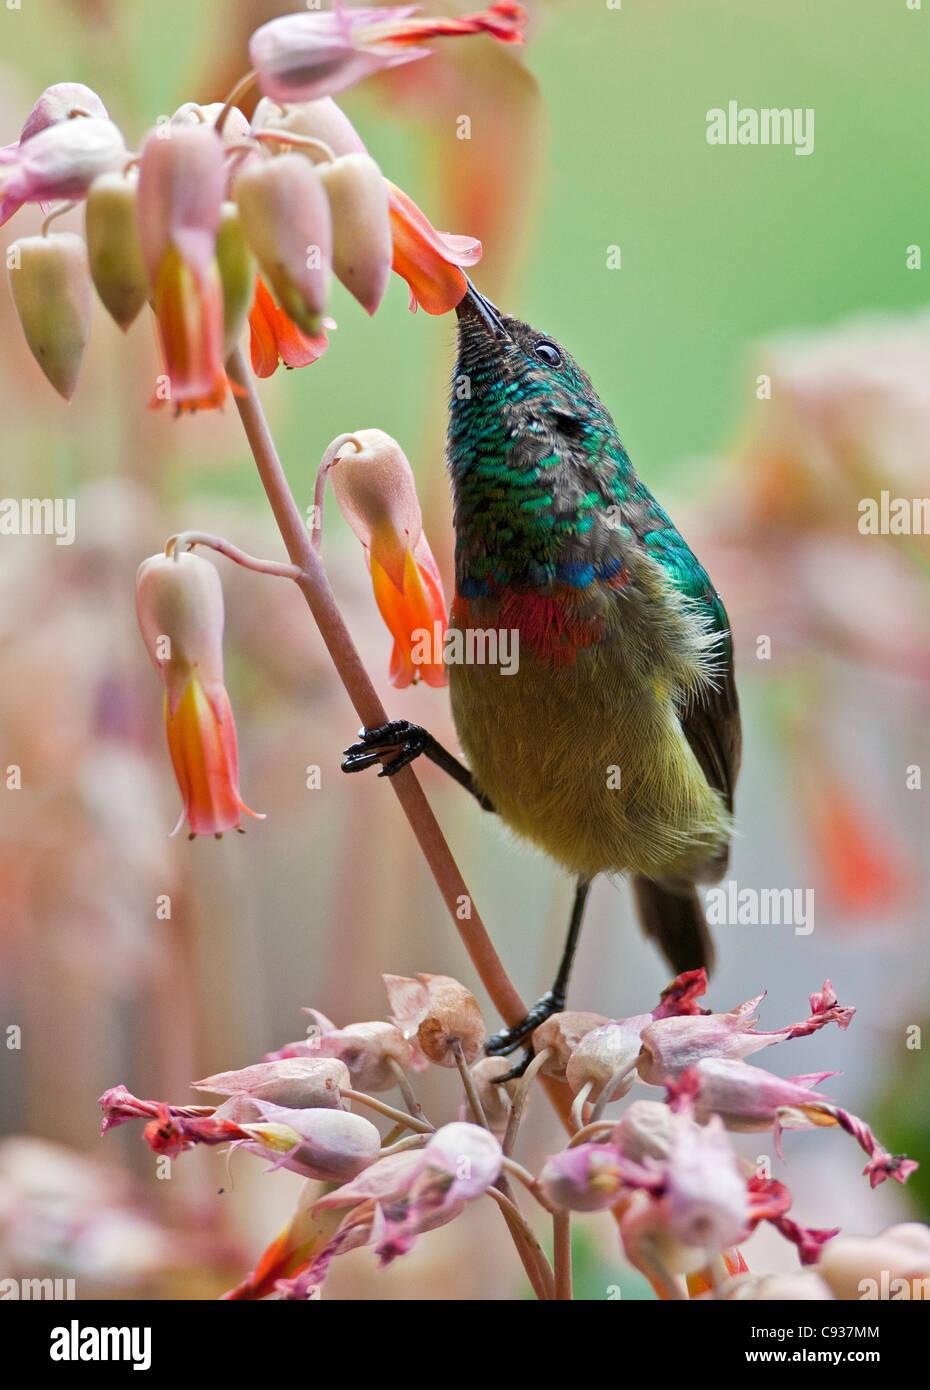 An Eastern Double-collared Sunbird. - Stock Image